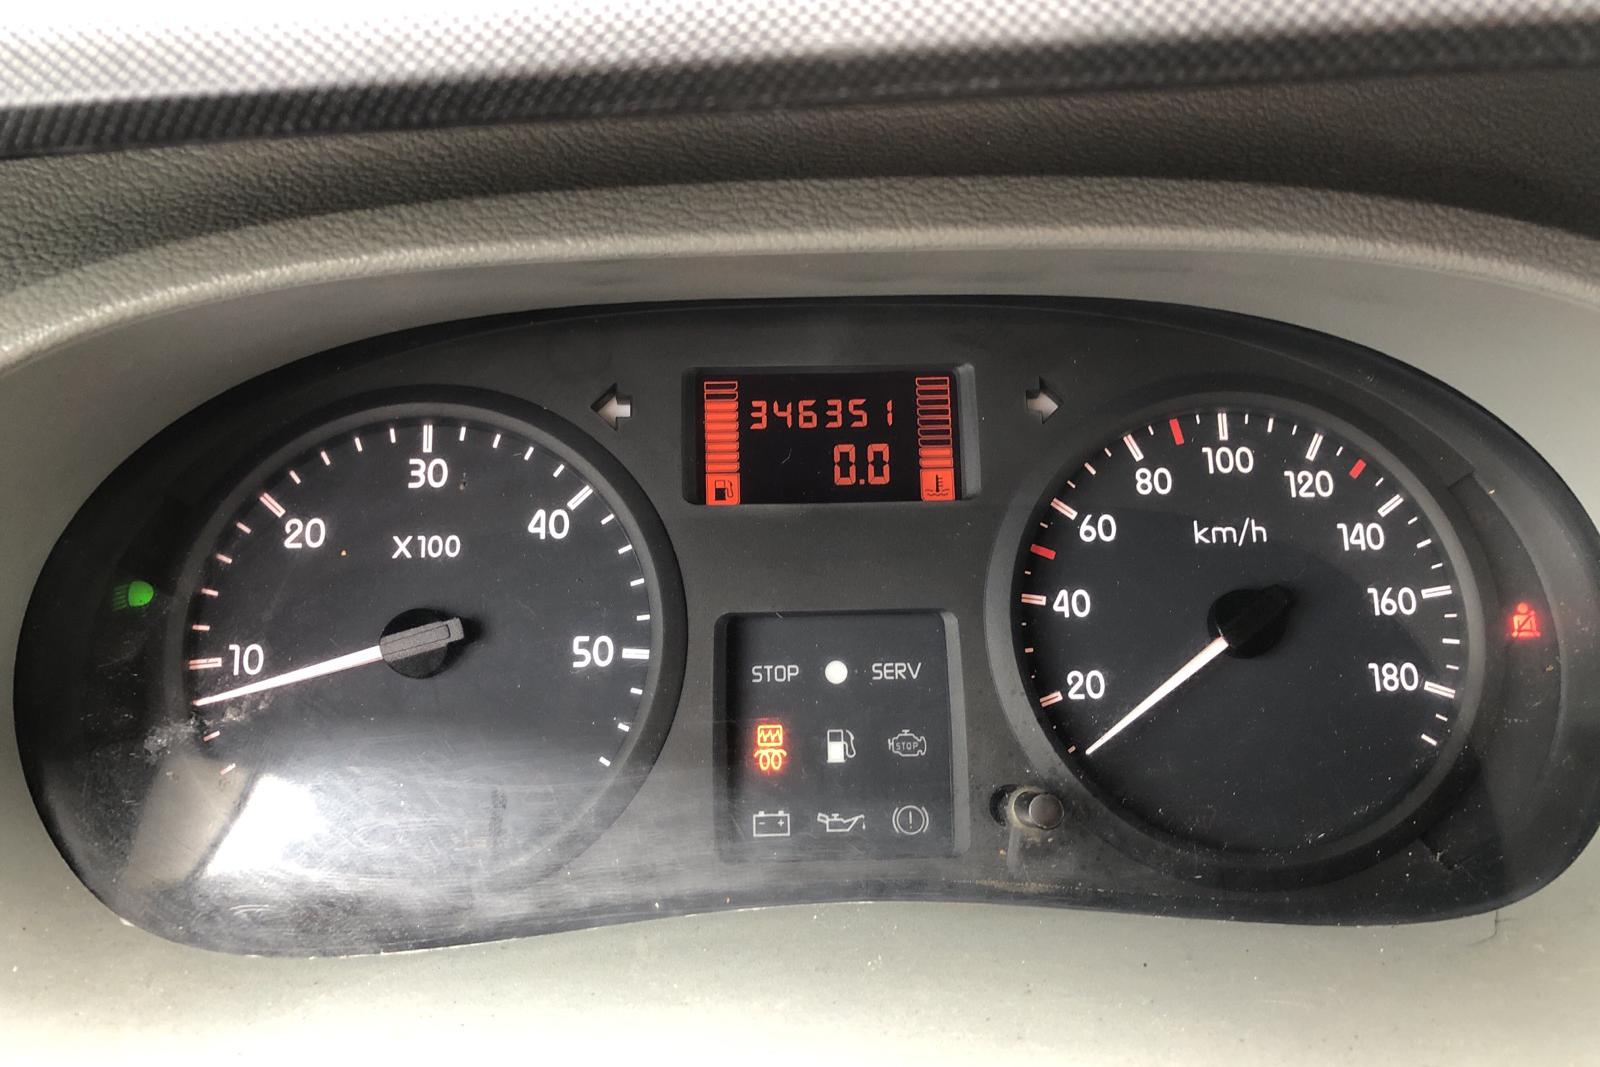 Renault Master 2.5 dCi Häst (115hk) - 346 350 km - Manual - Light Grey - 2003